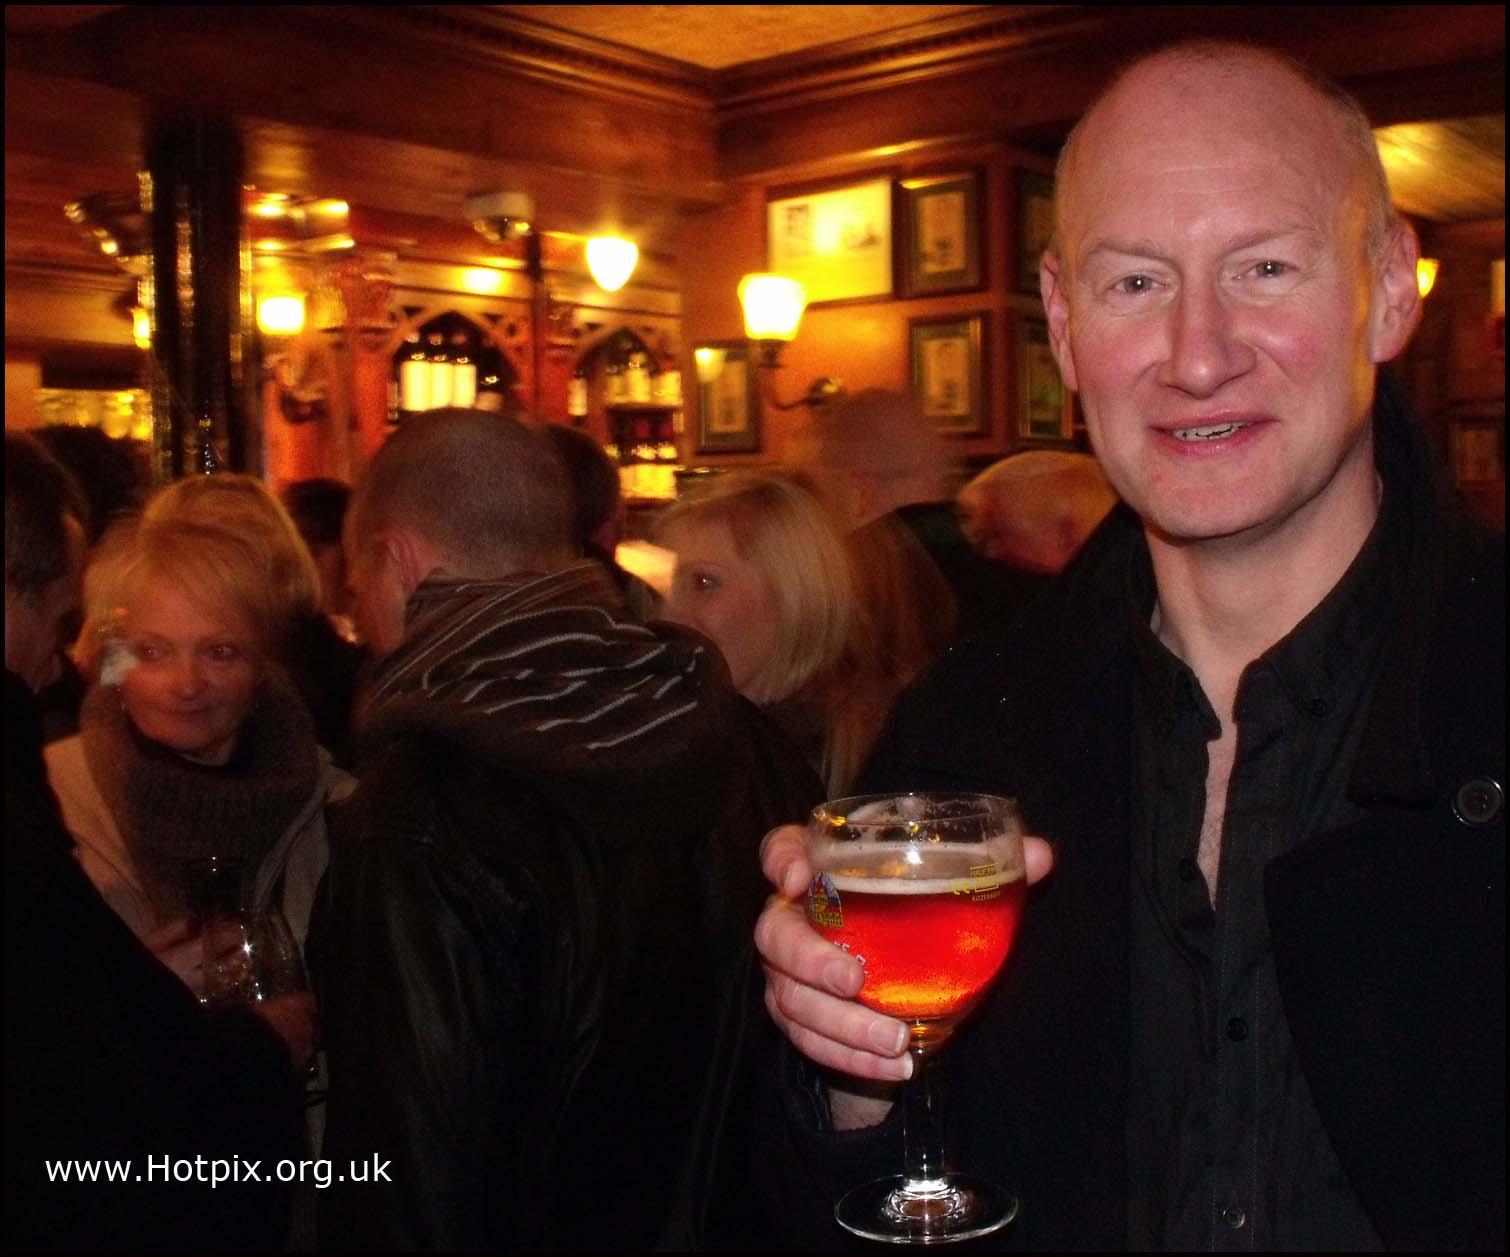 pub,crawl,manchester,real,ale,CAMRA,Gary,Cummings,GEC,go,easy,club,thegoeasyclub,goeasyclub,drink,beer,lager,leffe,glass,belgian,belgium,Blond,tony,smith,tonysmith,hotpix,hotpixuk,tdk,tdktony,belgique,bier,de,abby,abbey,city,favourite,pubs,public,houses